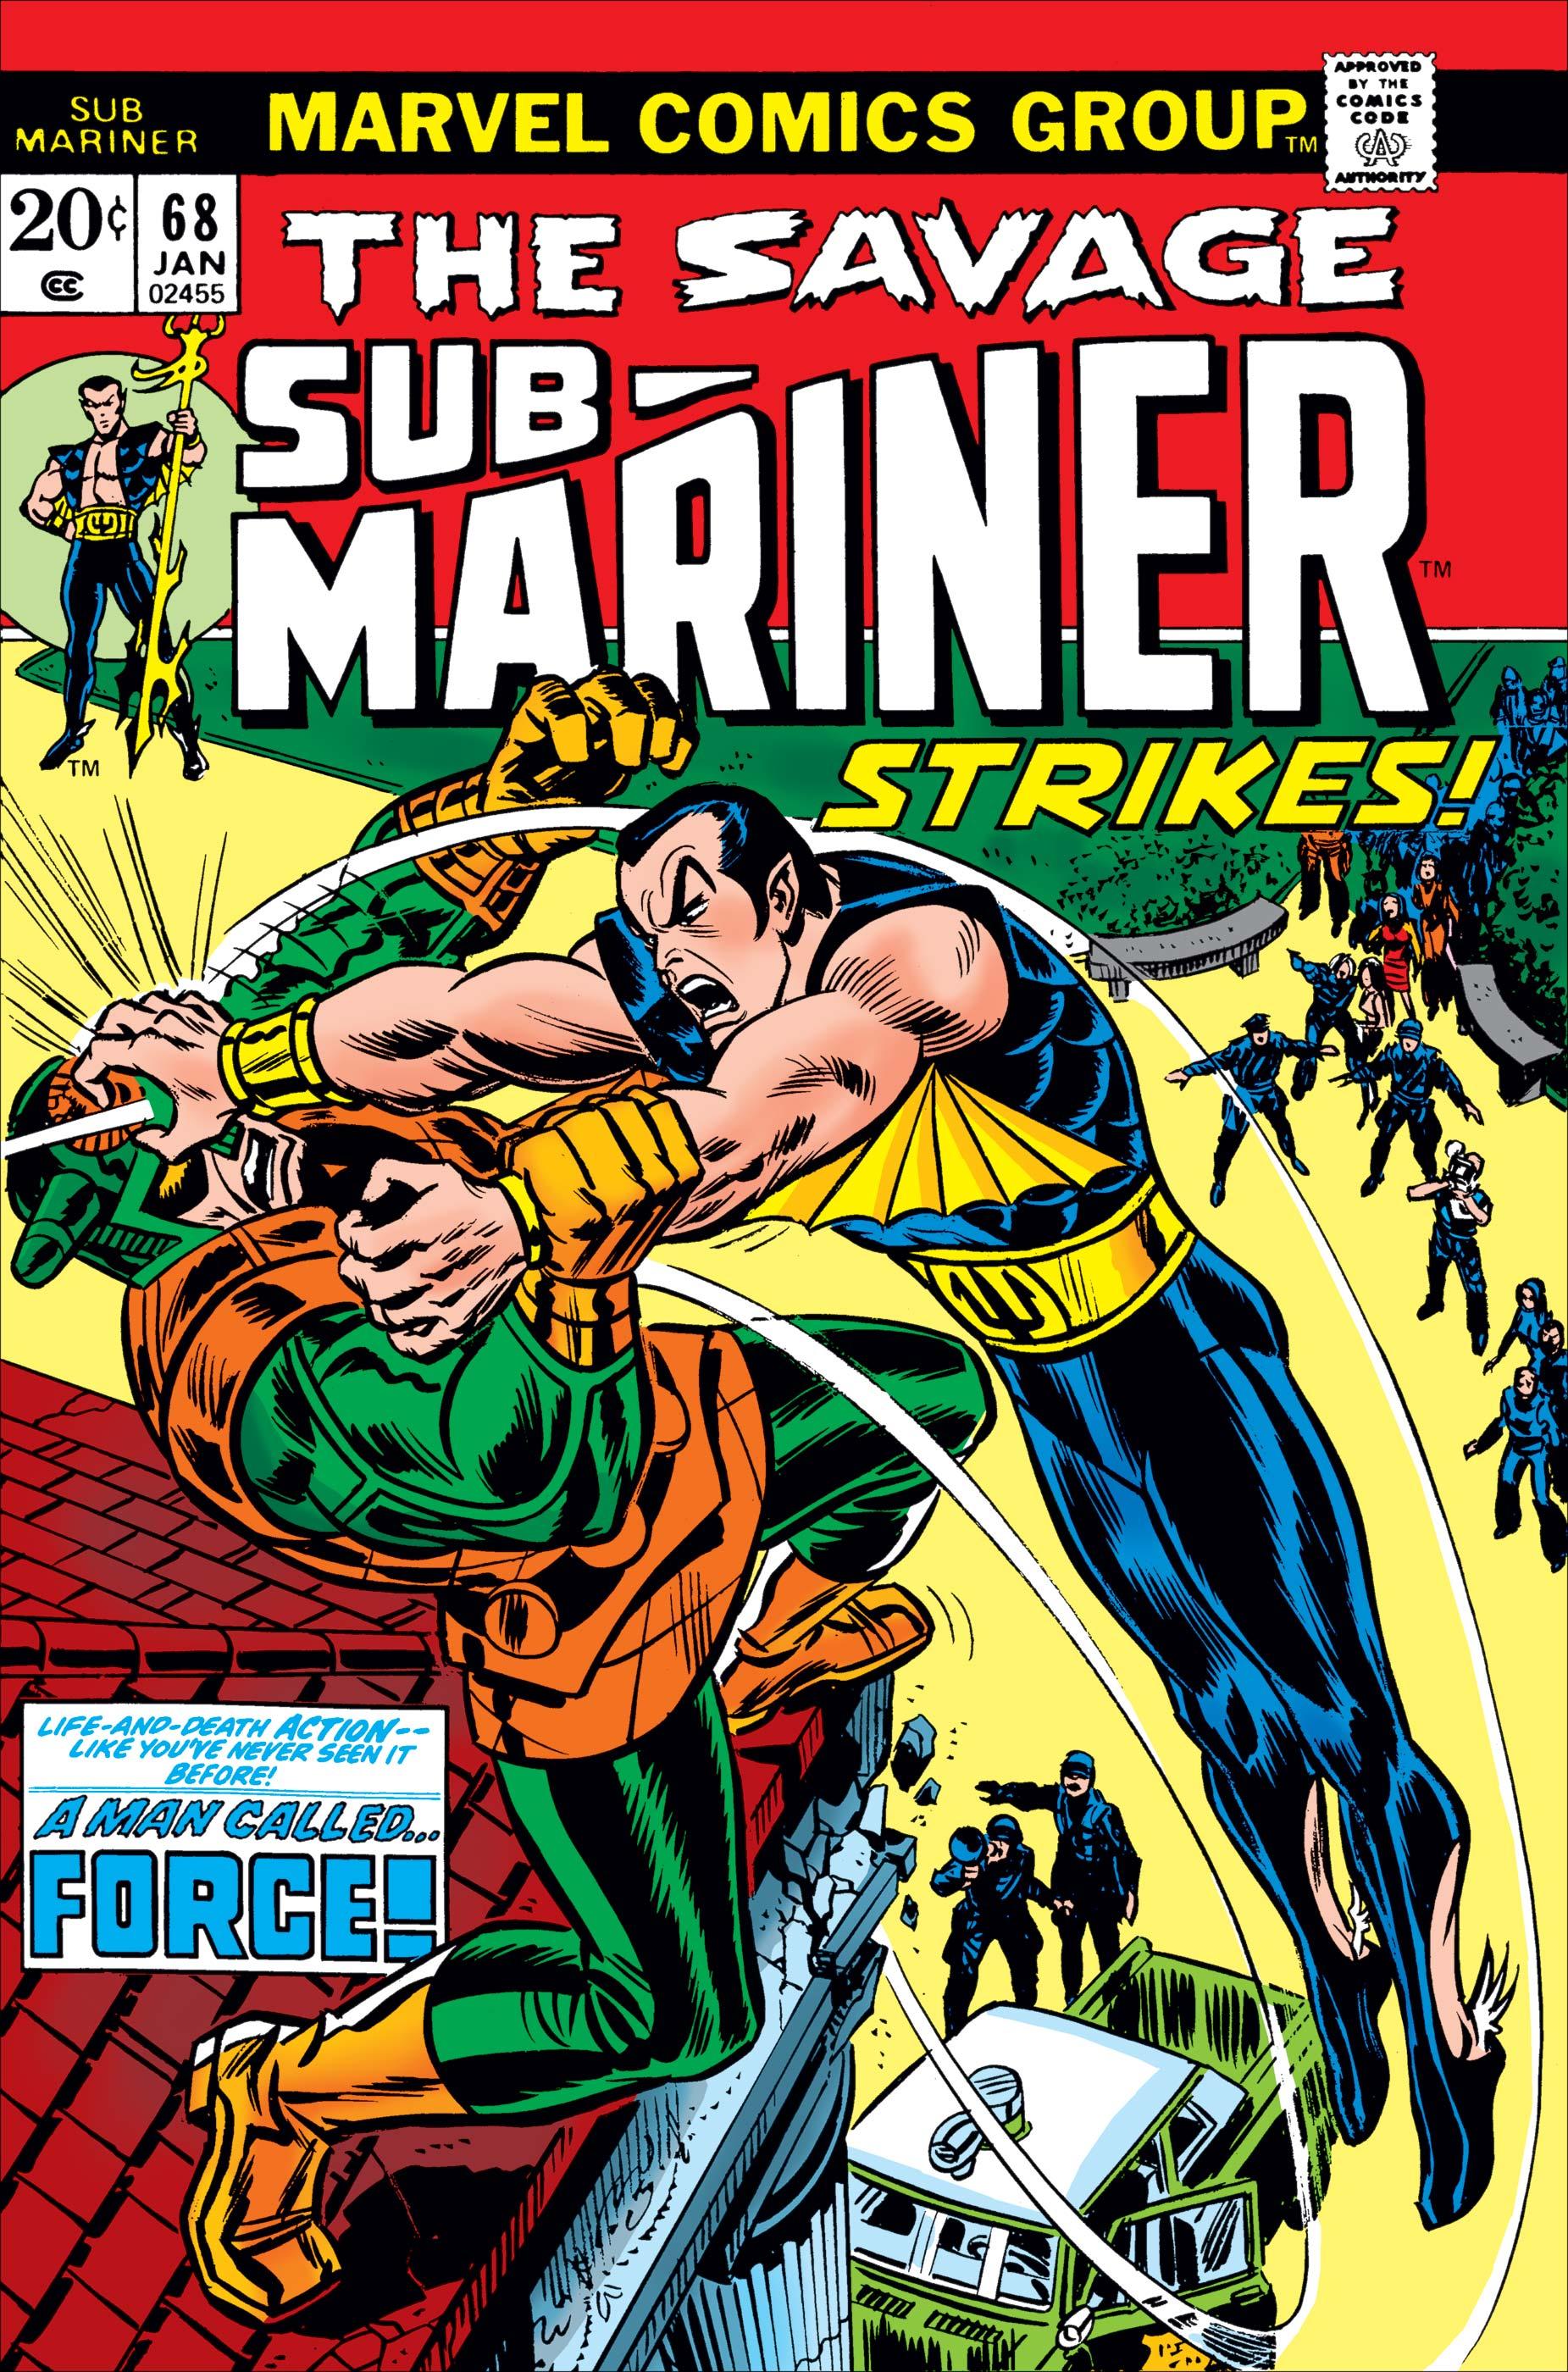 Sub-Mariner (1968) #68